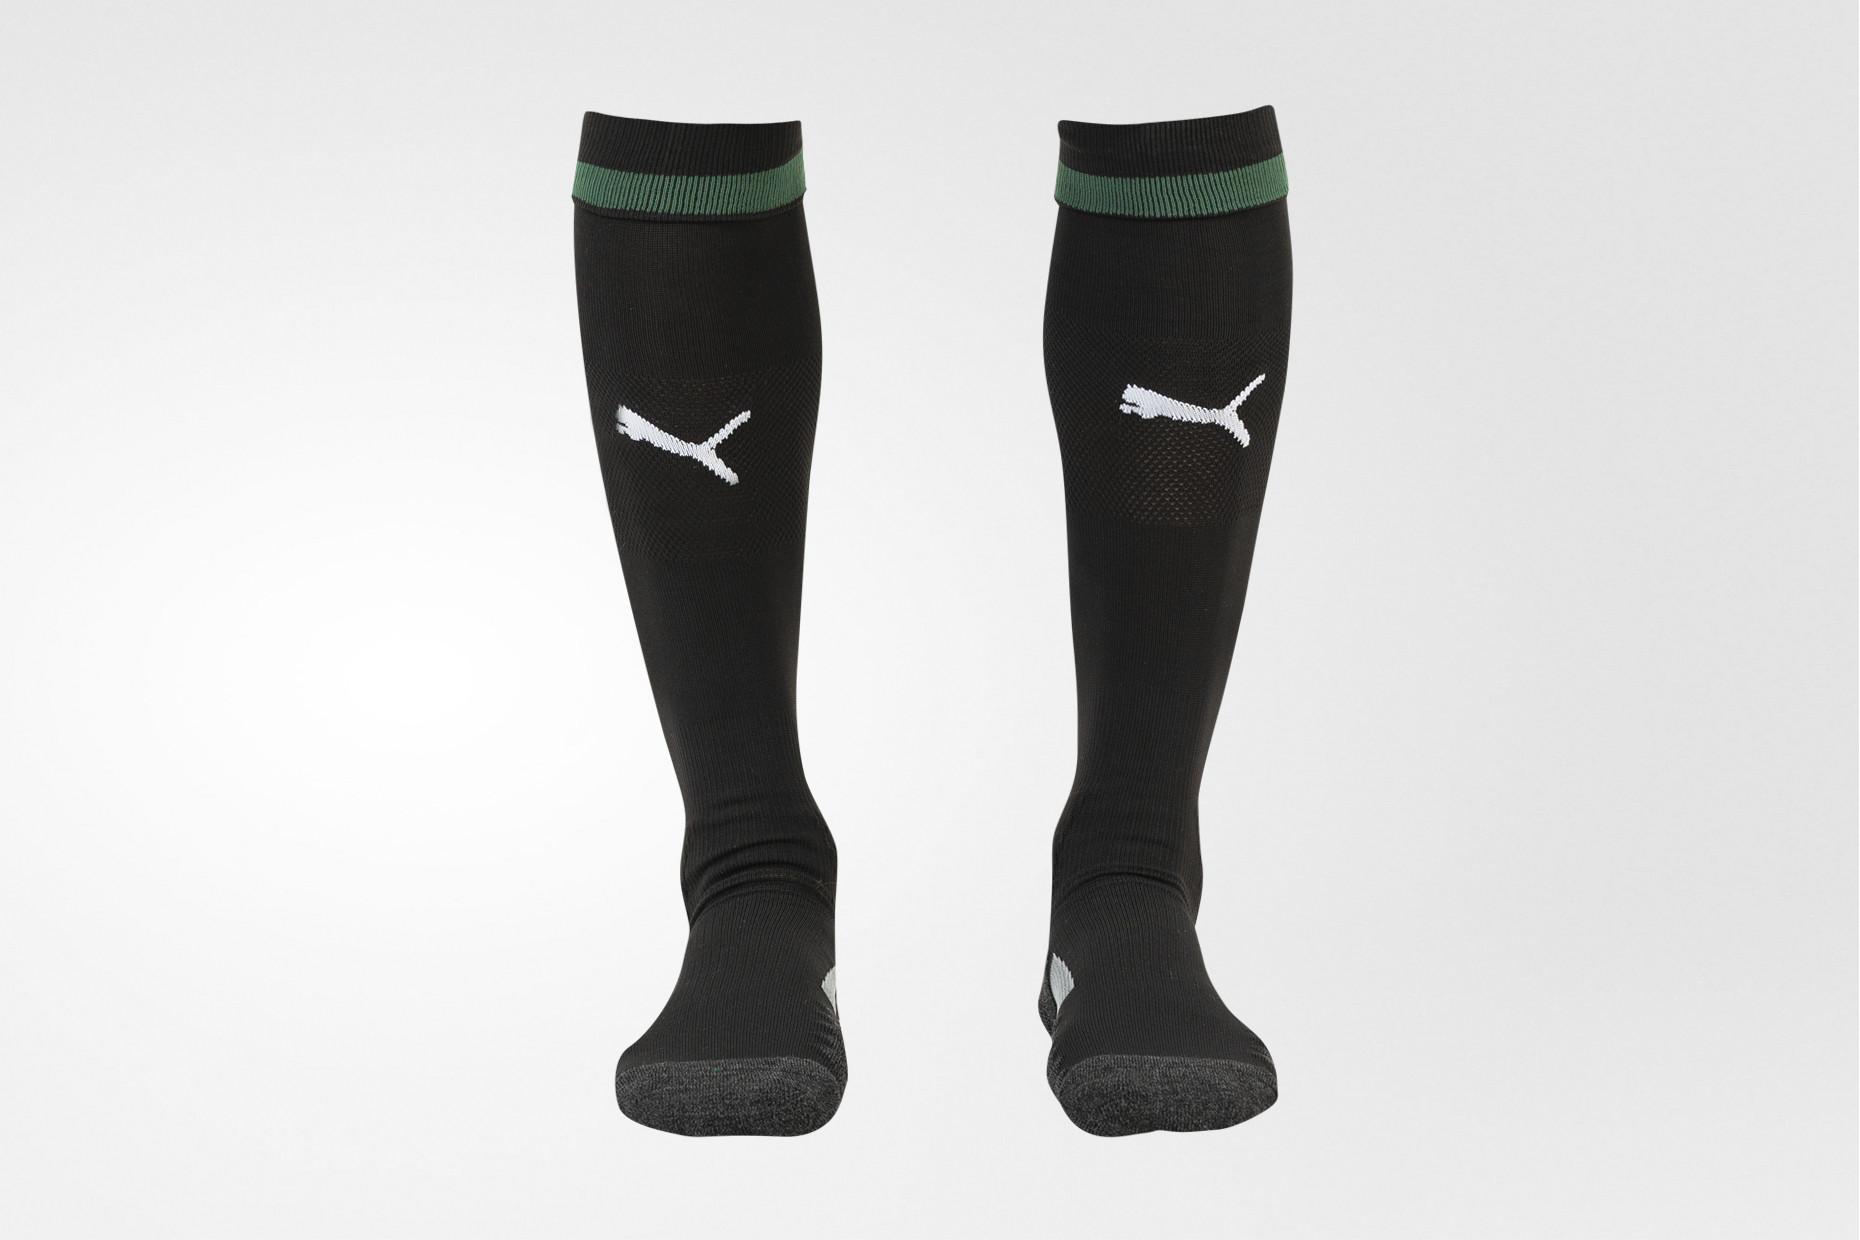 5275ecb070c4 Гетры Puma FC Krasnodar Separate Socks 18 19